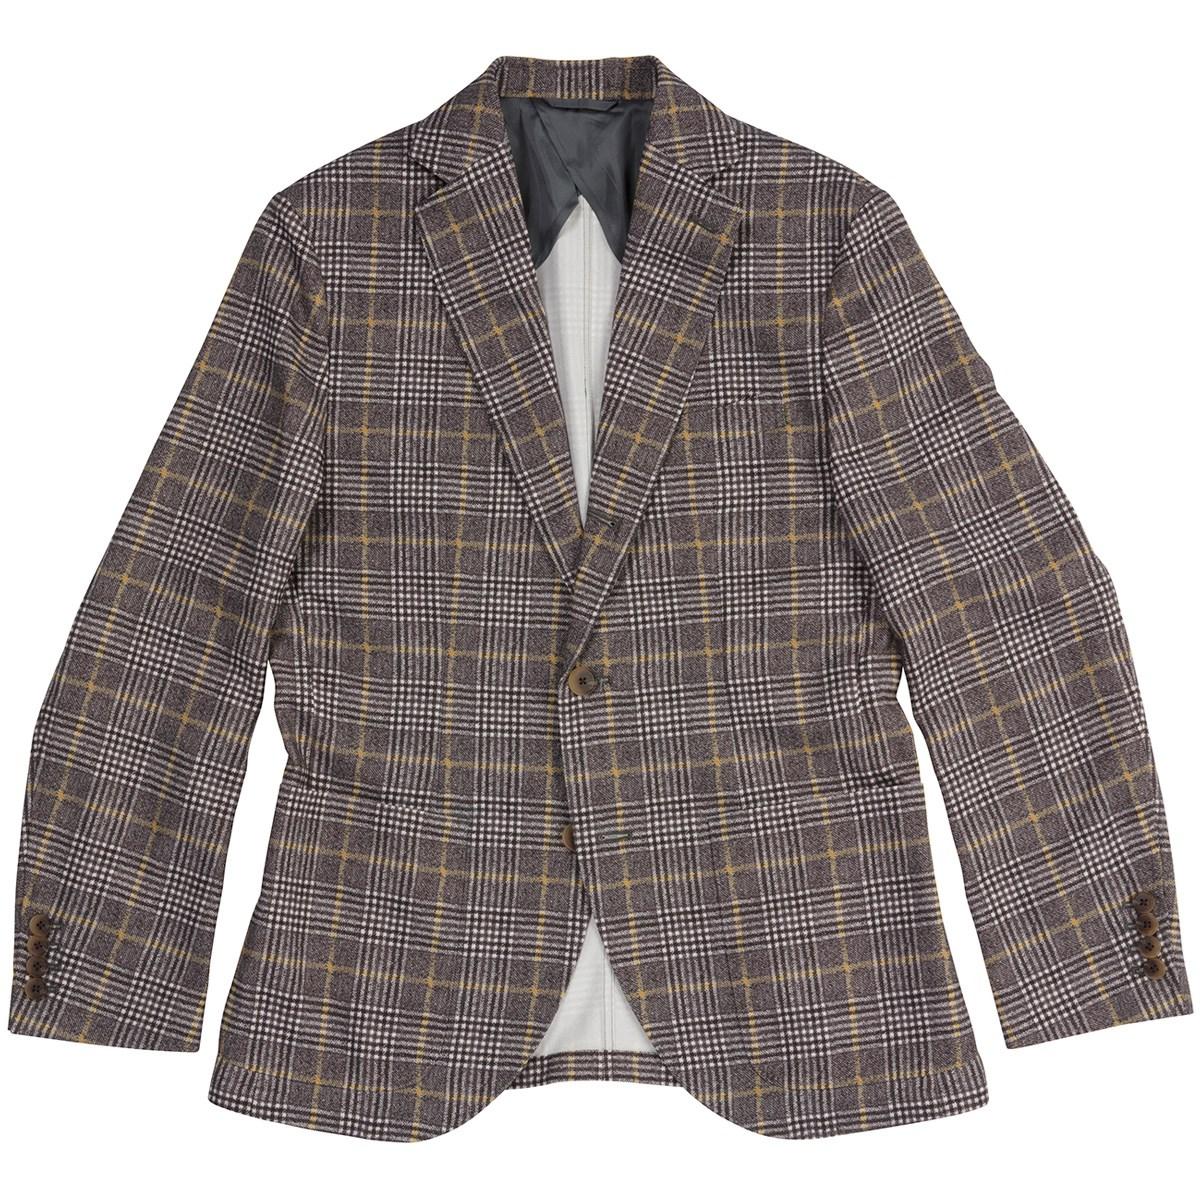 GDO オリジナル ウール調プリントジャケット